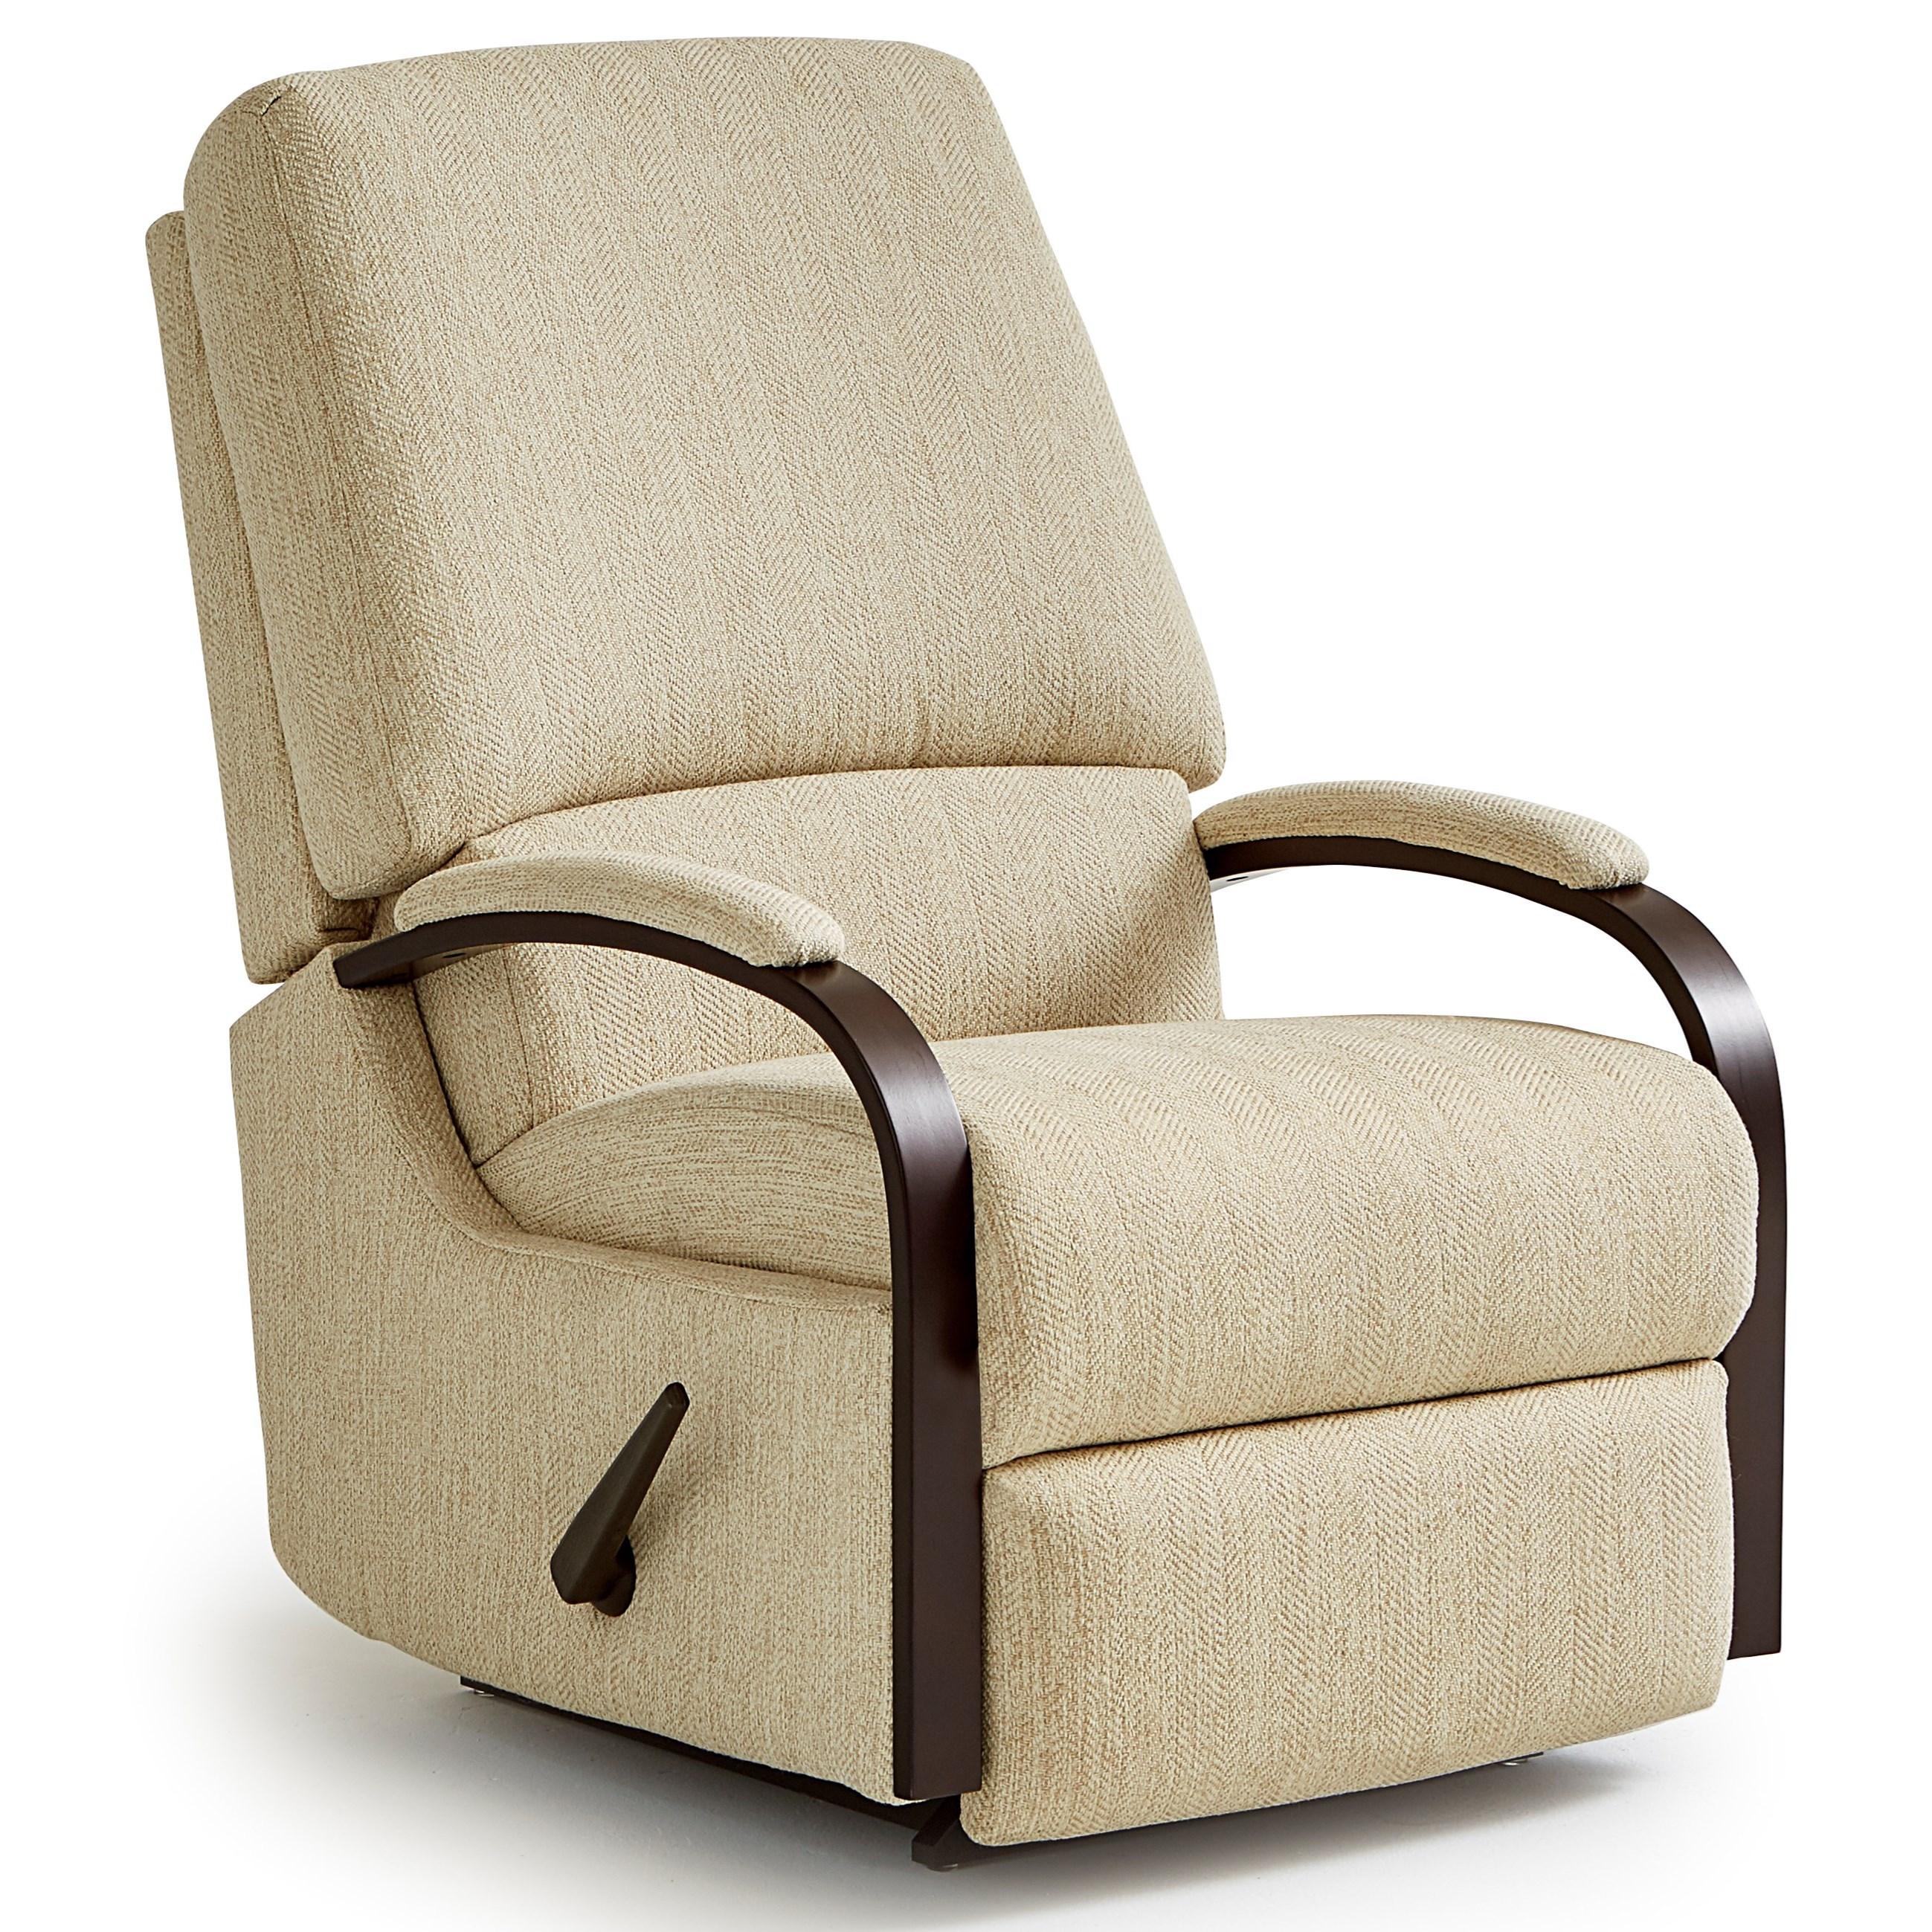 Best Home Furnishings Recliners Medium 7nw04dp Pike Blu Dot Sofa Bed Sunday